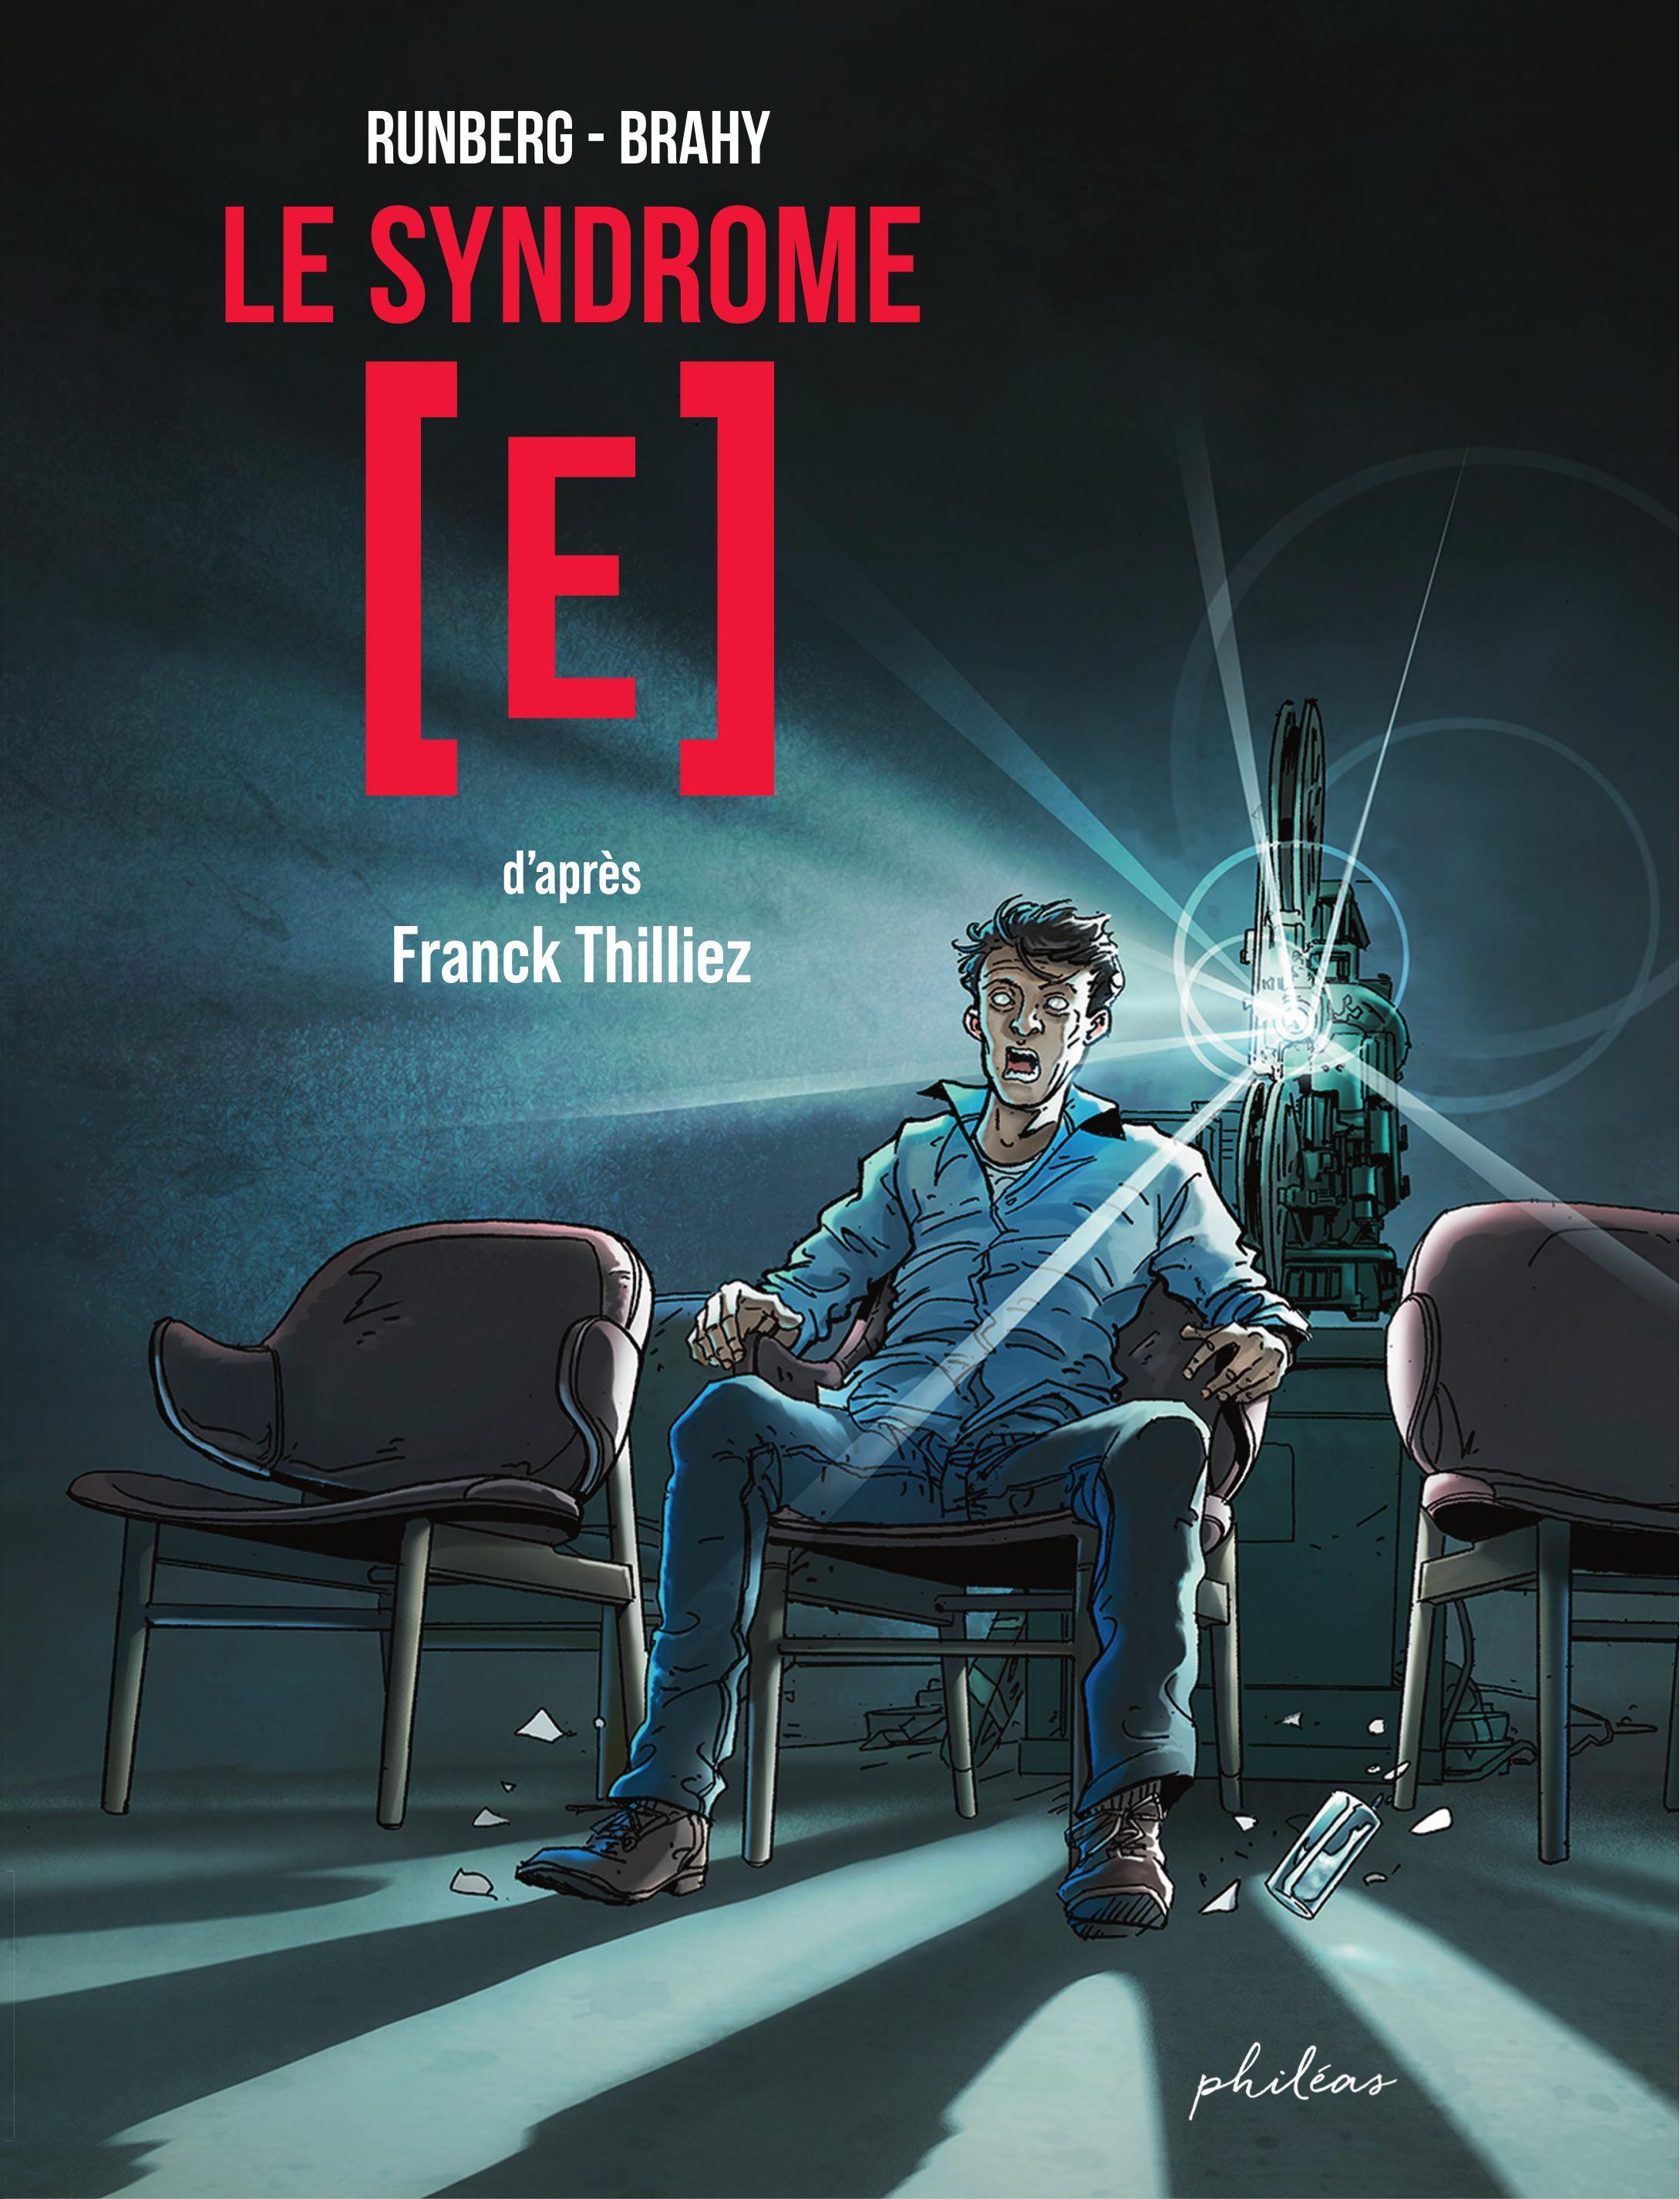 Le syndrome [E] 1 - Le syndrome [E]